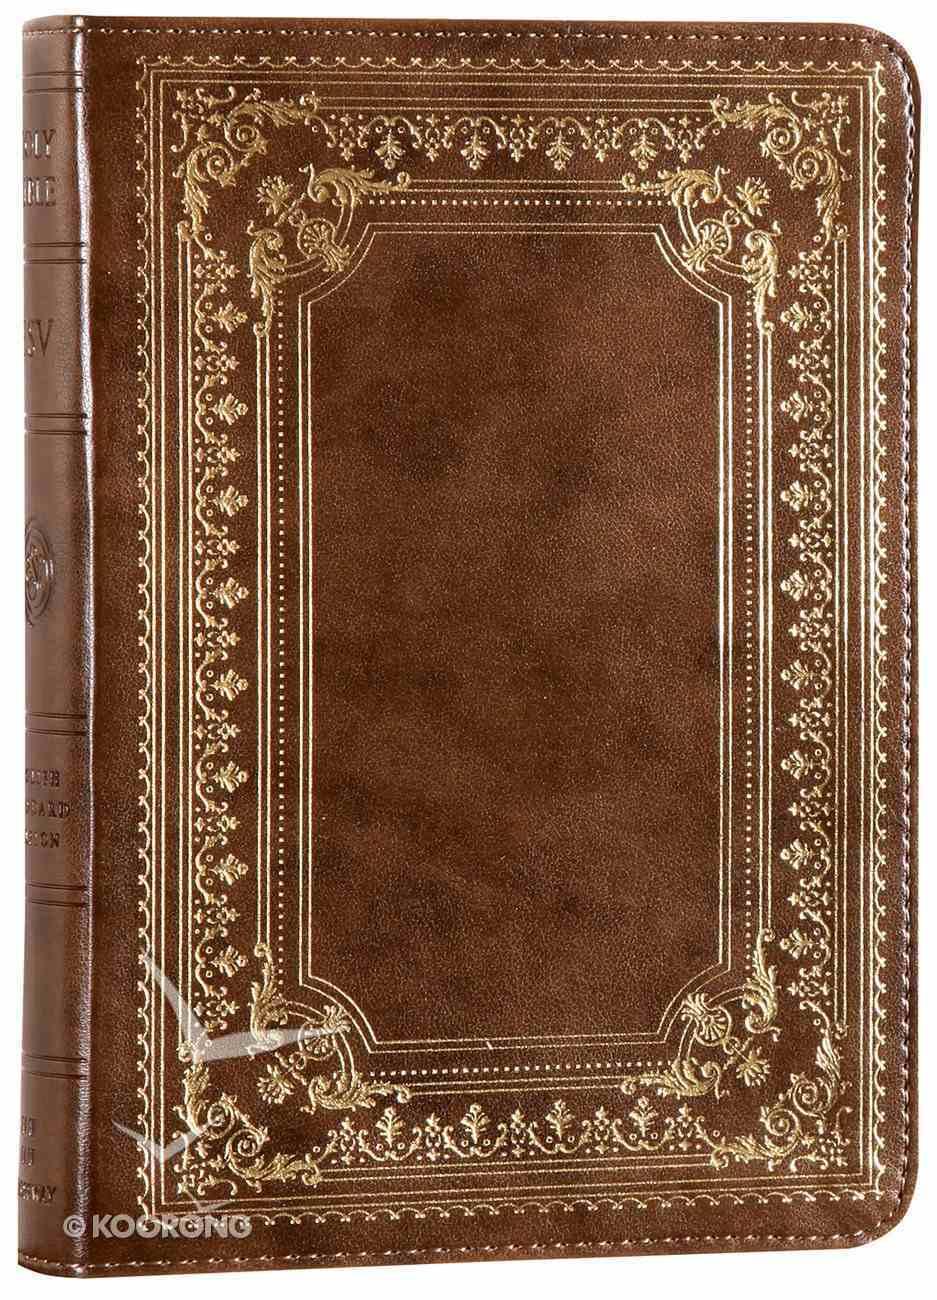 ESV Large Print Compact Bible Trutone Classic Frame Design Brown Imitation Leather